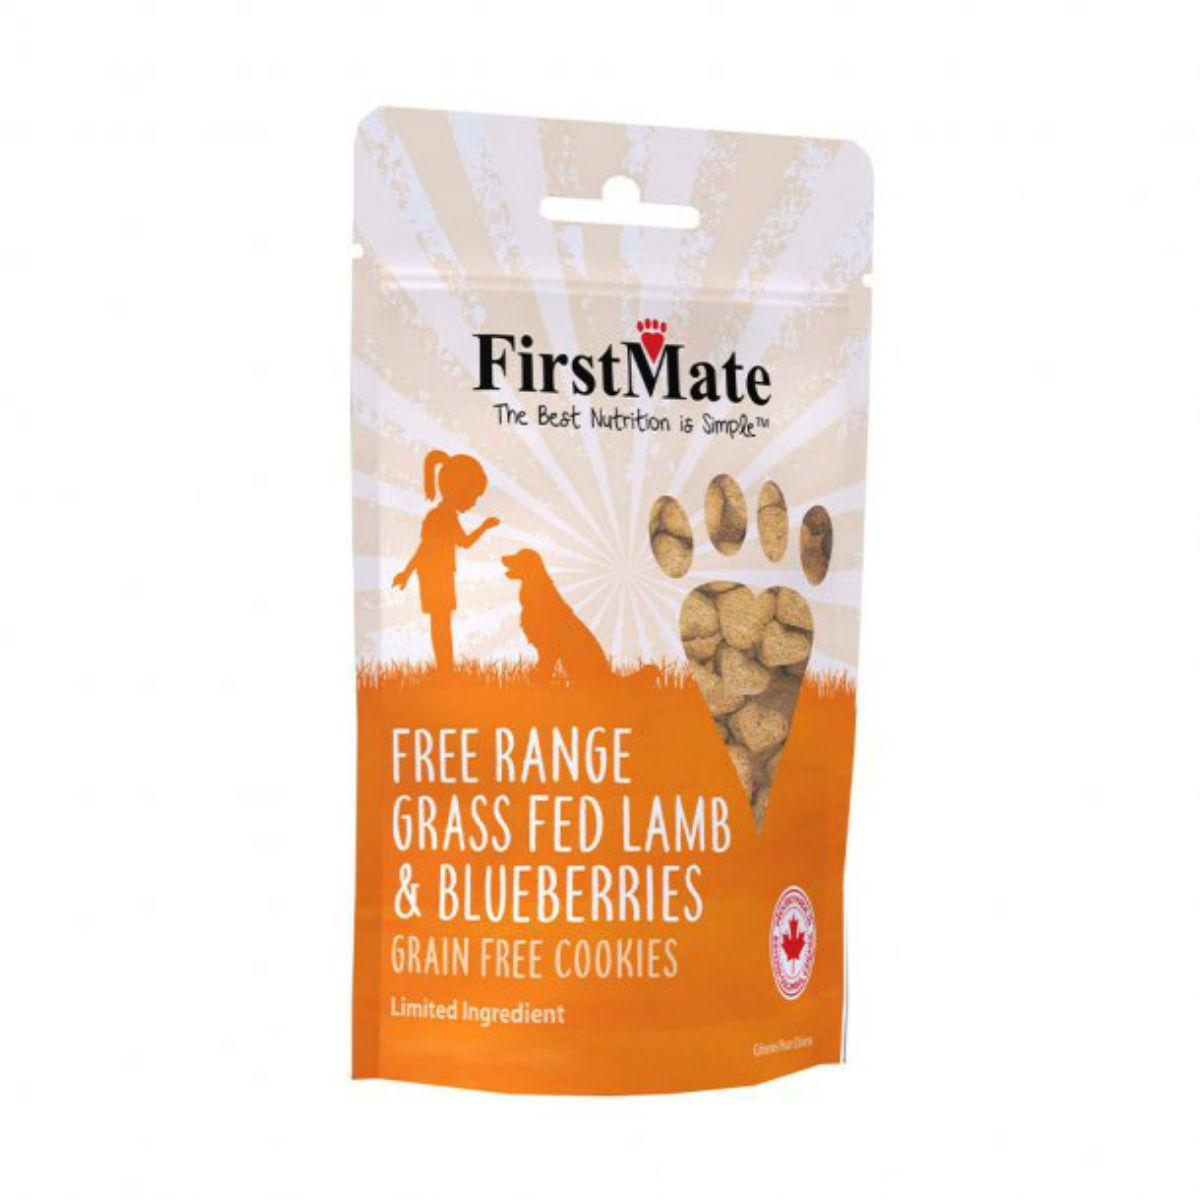 FirstMate Grain Free Cookie Dog Treats - Lamb & Blueberries